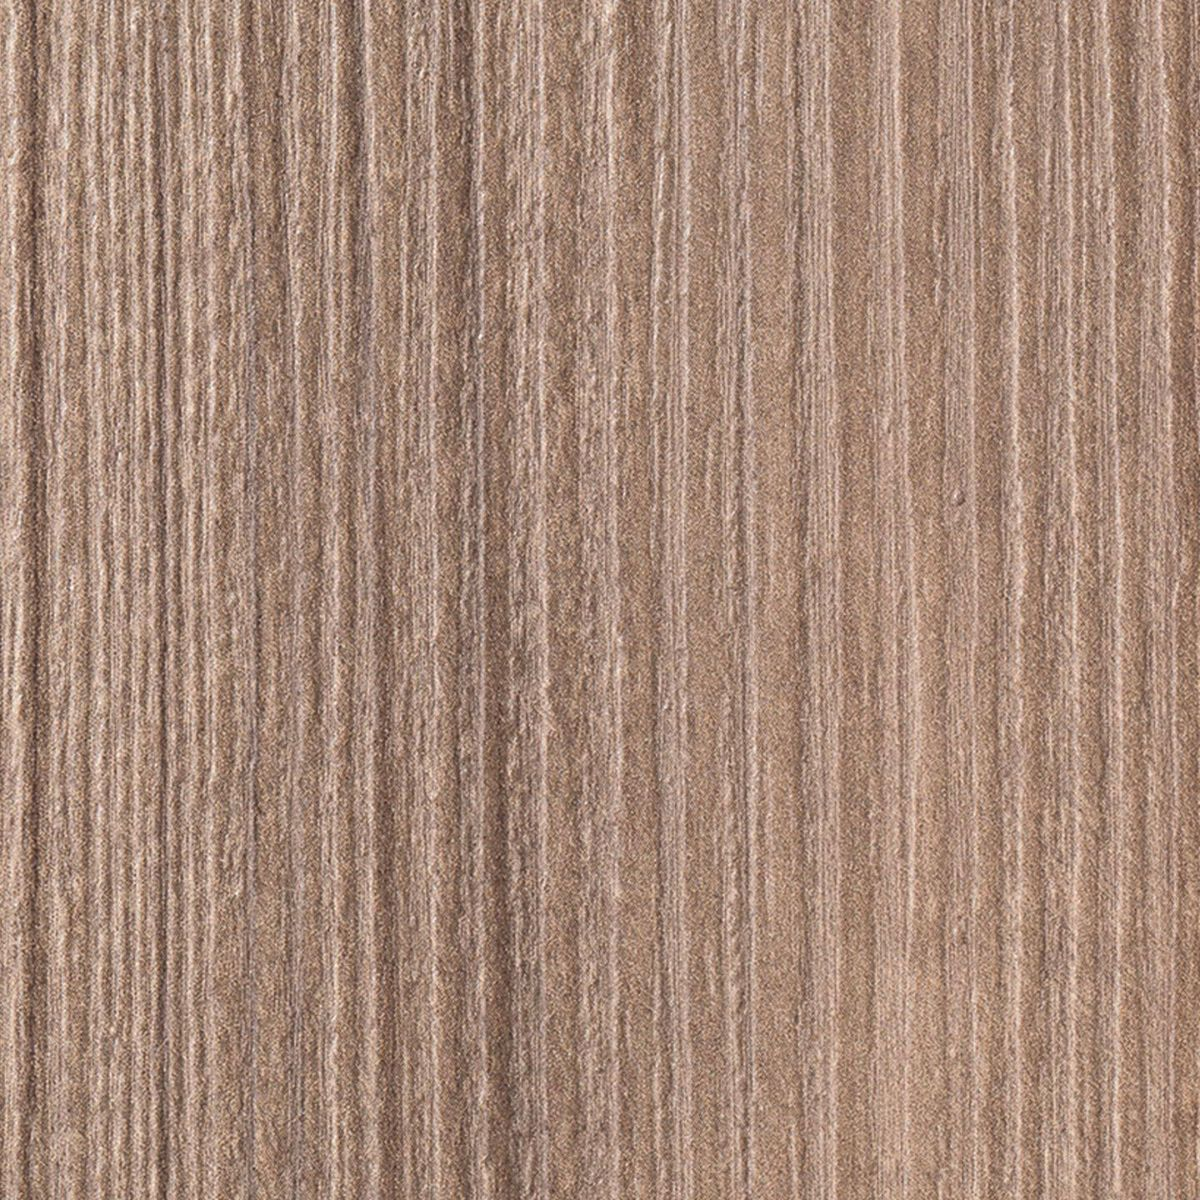 Marbella matrix cherry wood panels finish for glass walls